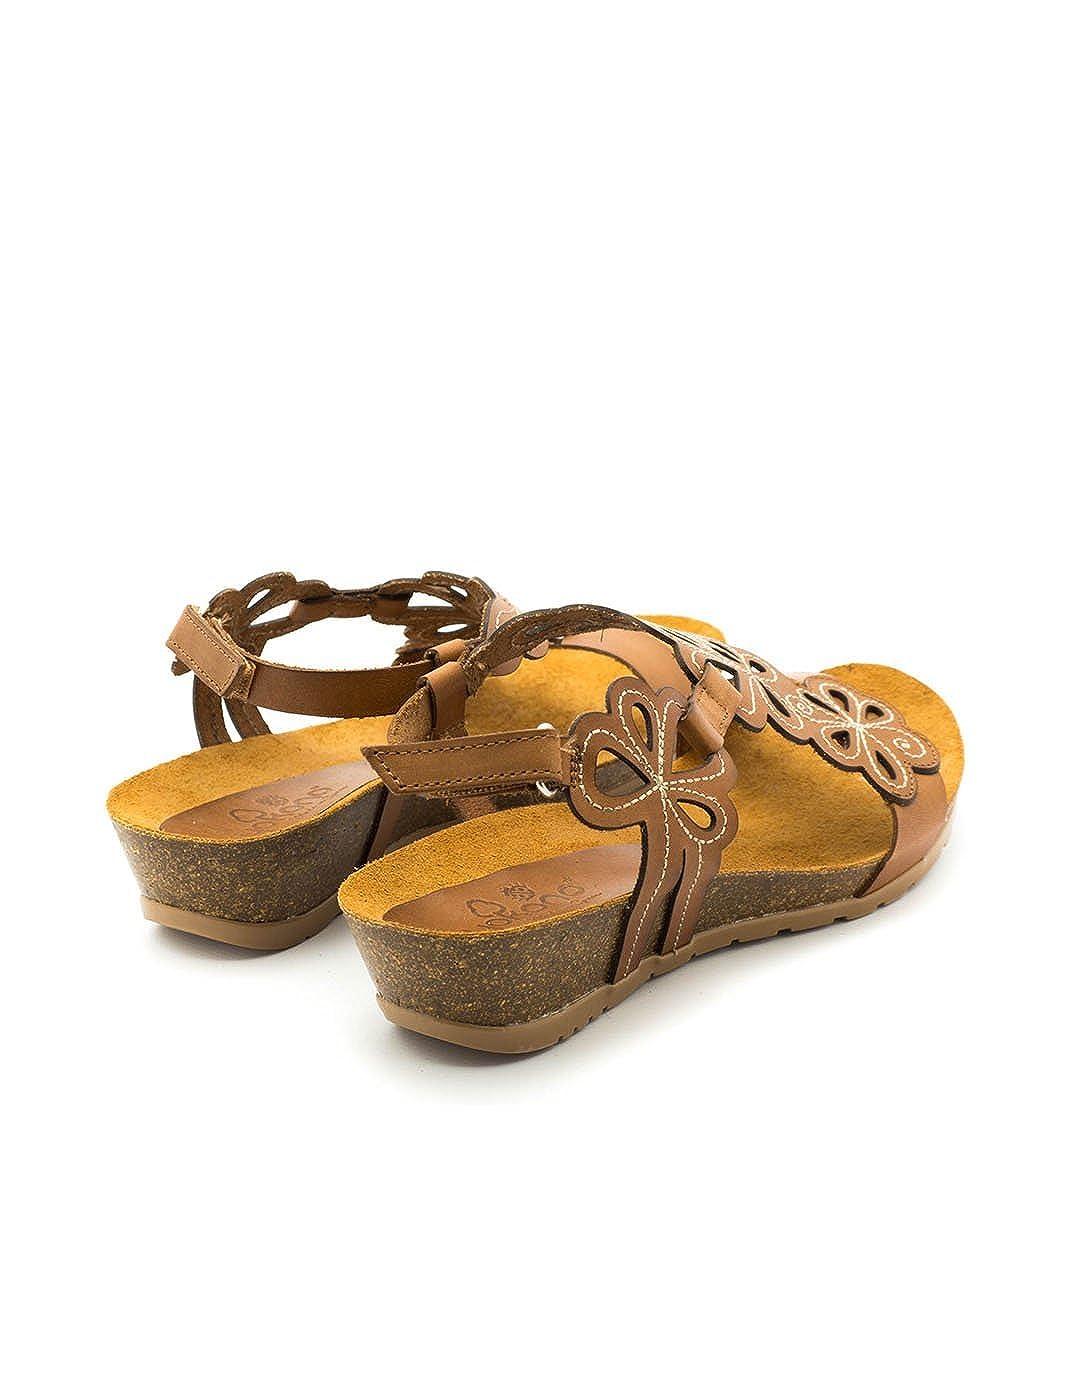 056 Amazon es Y Negra Piel Sandalia Yokono Zapatos Java De 6YzRqX